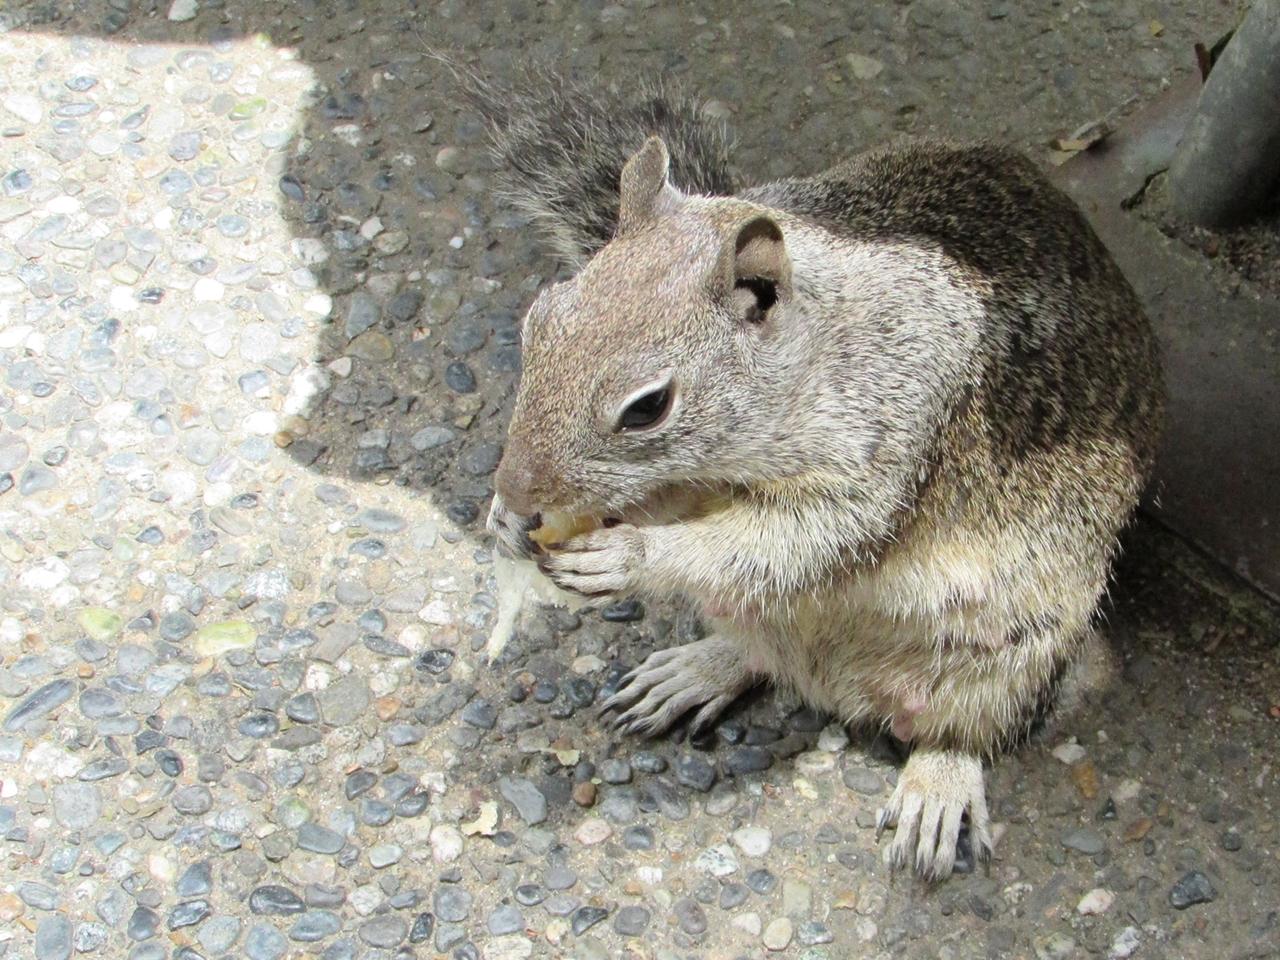 USA Rundreise - Amerika Westküste - Yosemite Nationalpark - Squirrel Hörnchen - Fashionladyloves